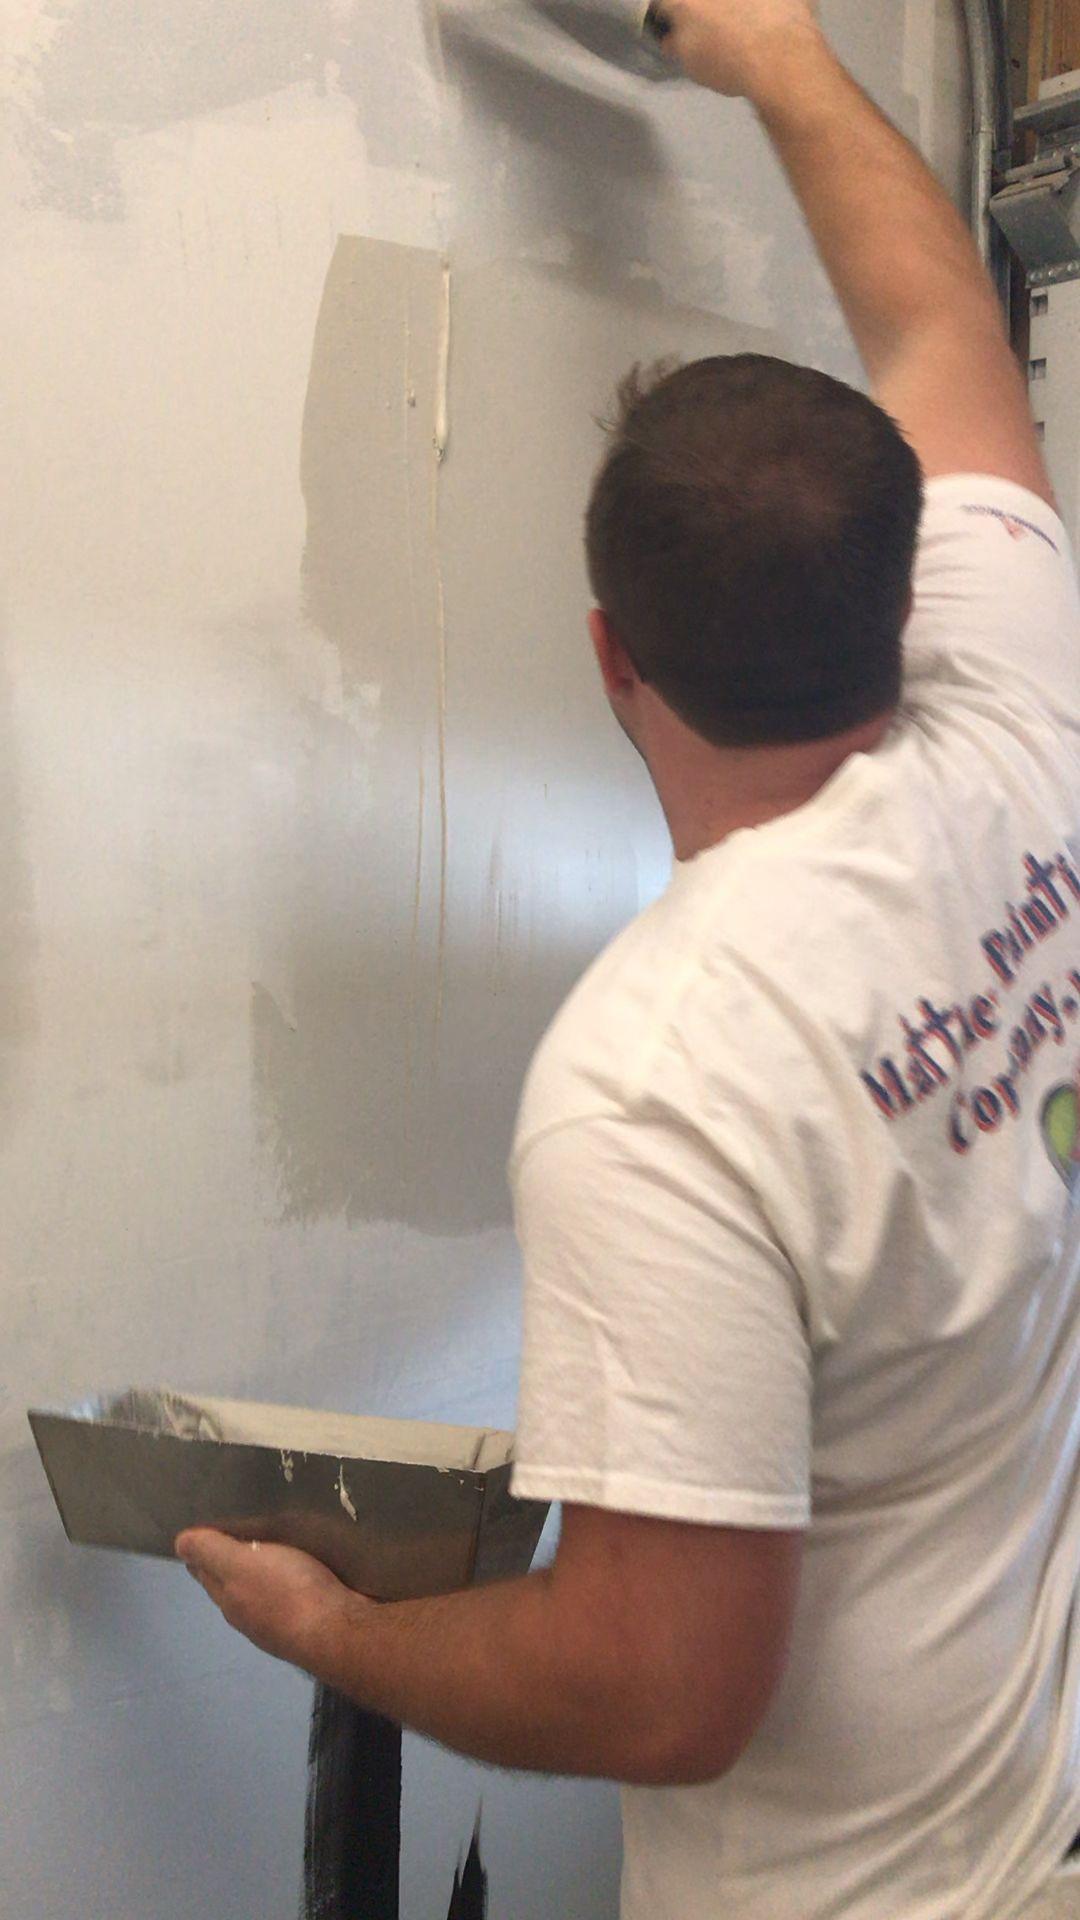 Skim Coating Walls Video Plaster Walls Diy Painting Concrete Walls Painting Concrete